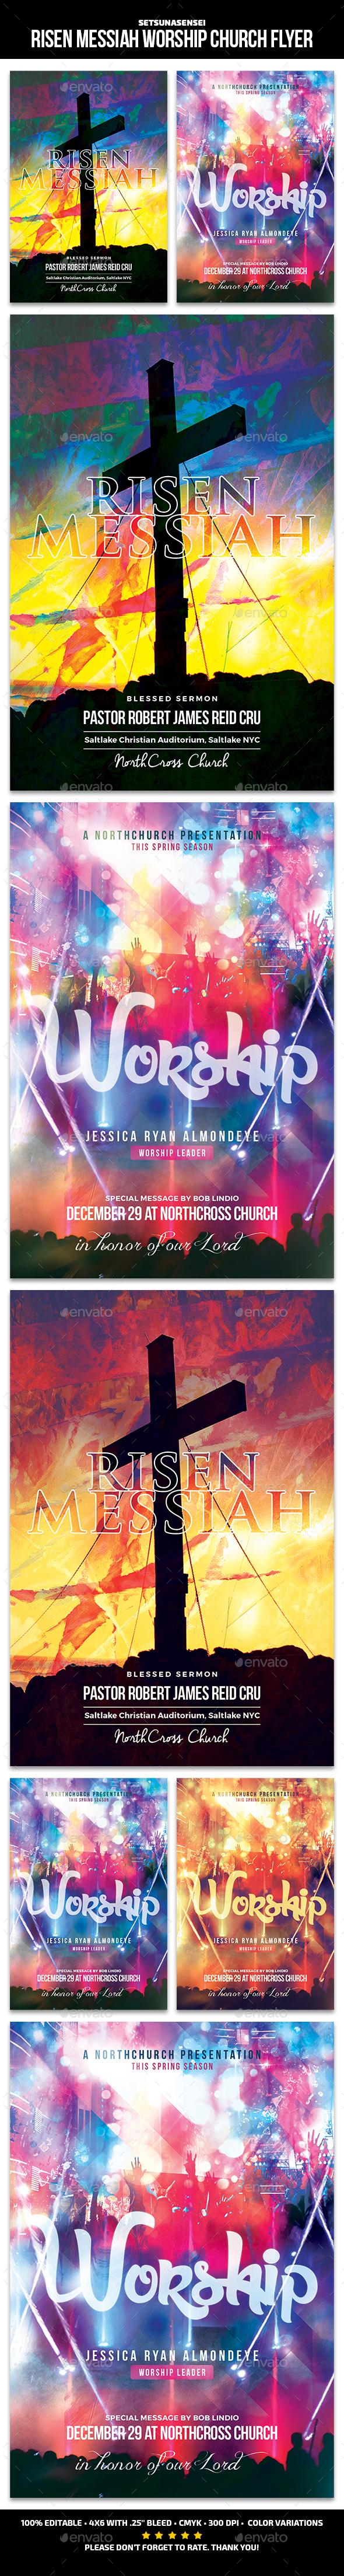 Risen Messiah Church Flyer - Church Flyers